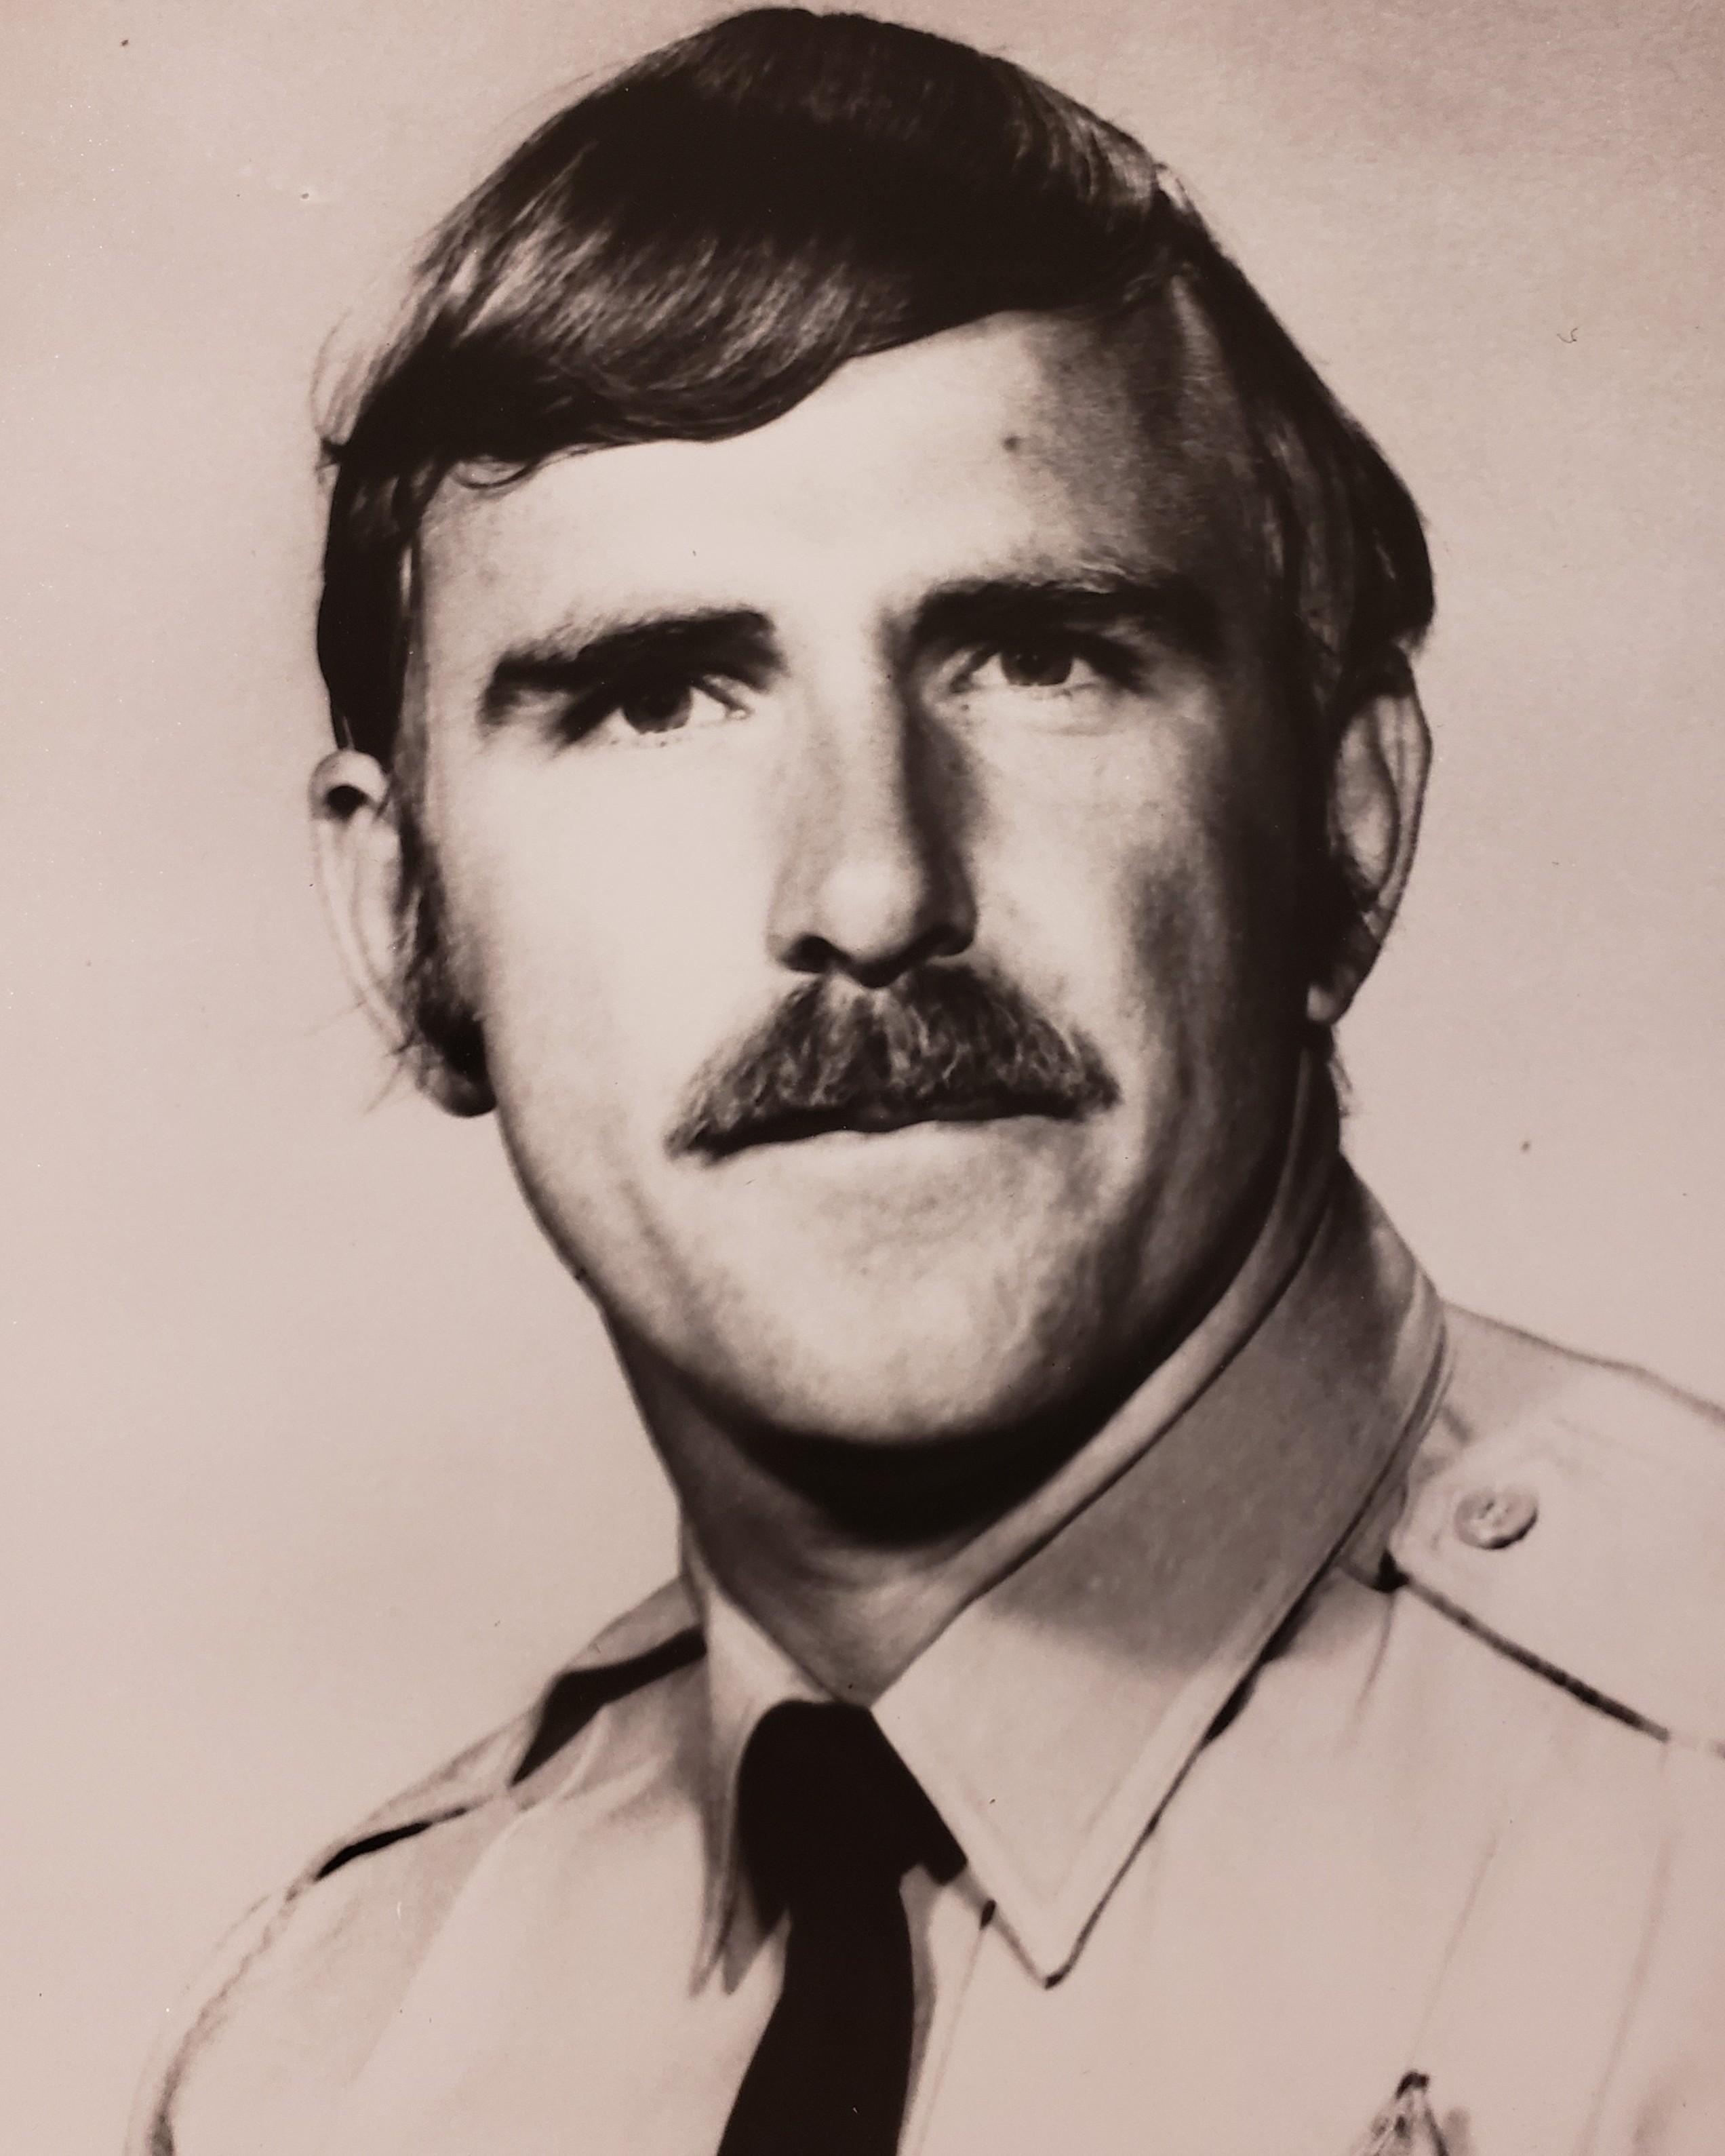 Deputy Sheriff George R. Barthel | Los Angeles County Sheriff's Department, California